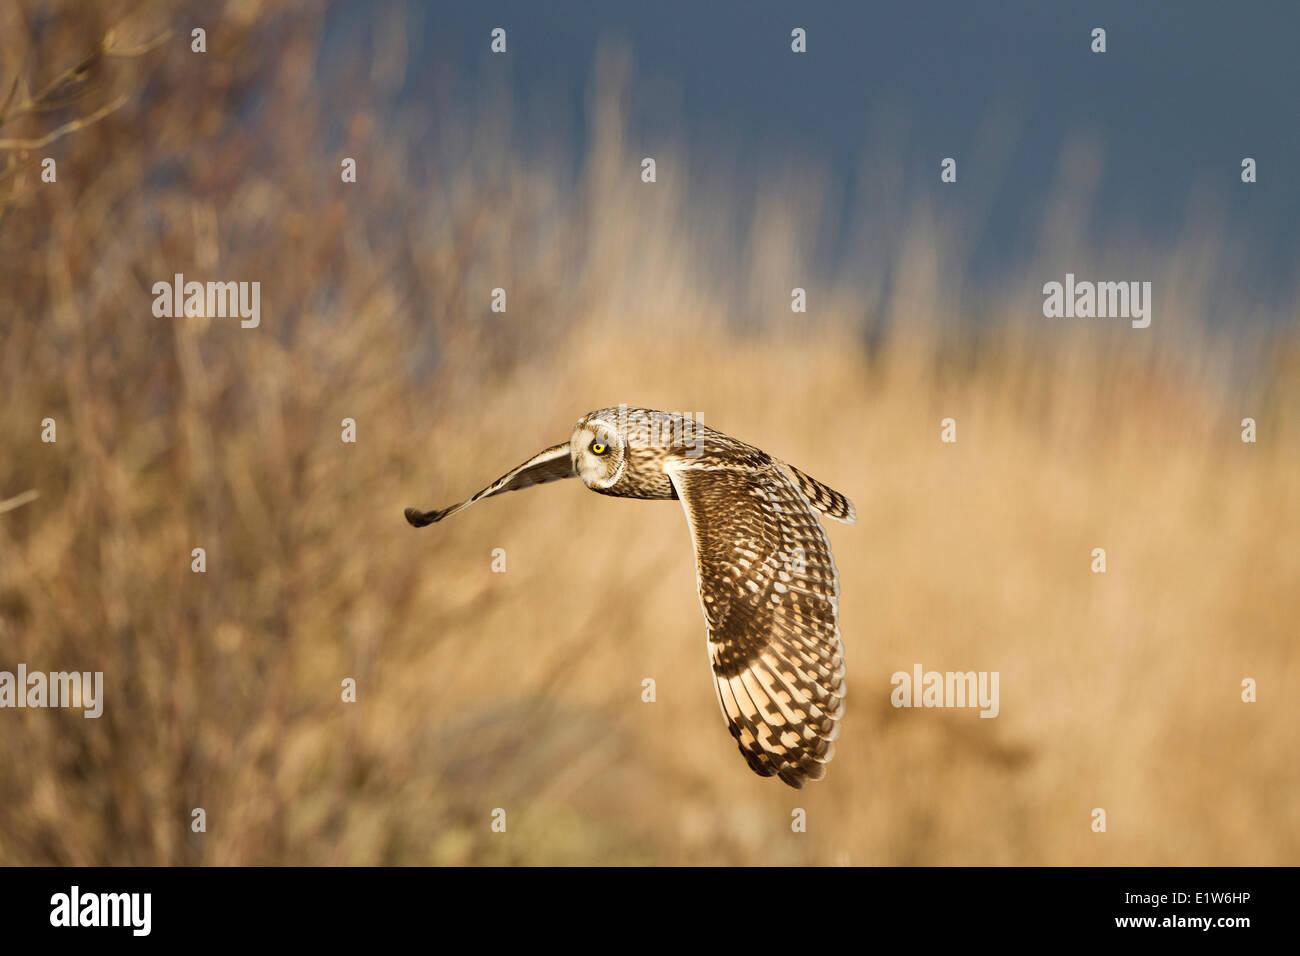 Short-eared owl (Asio flammeus), in flight, Brunswick Point, Delta, British Columbia. - Stock Image